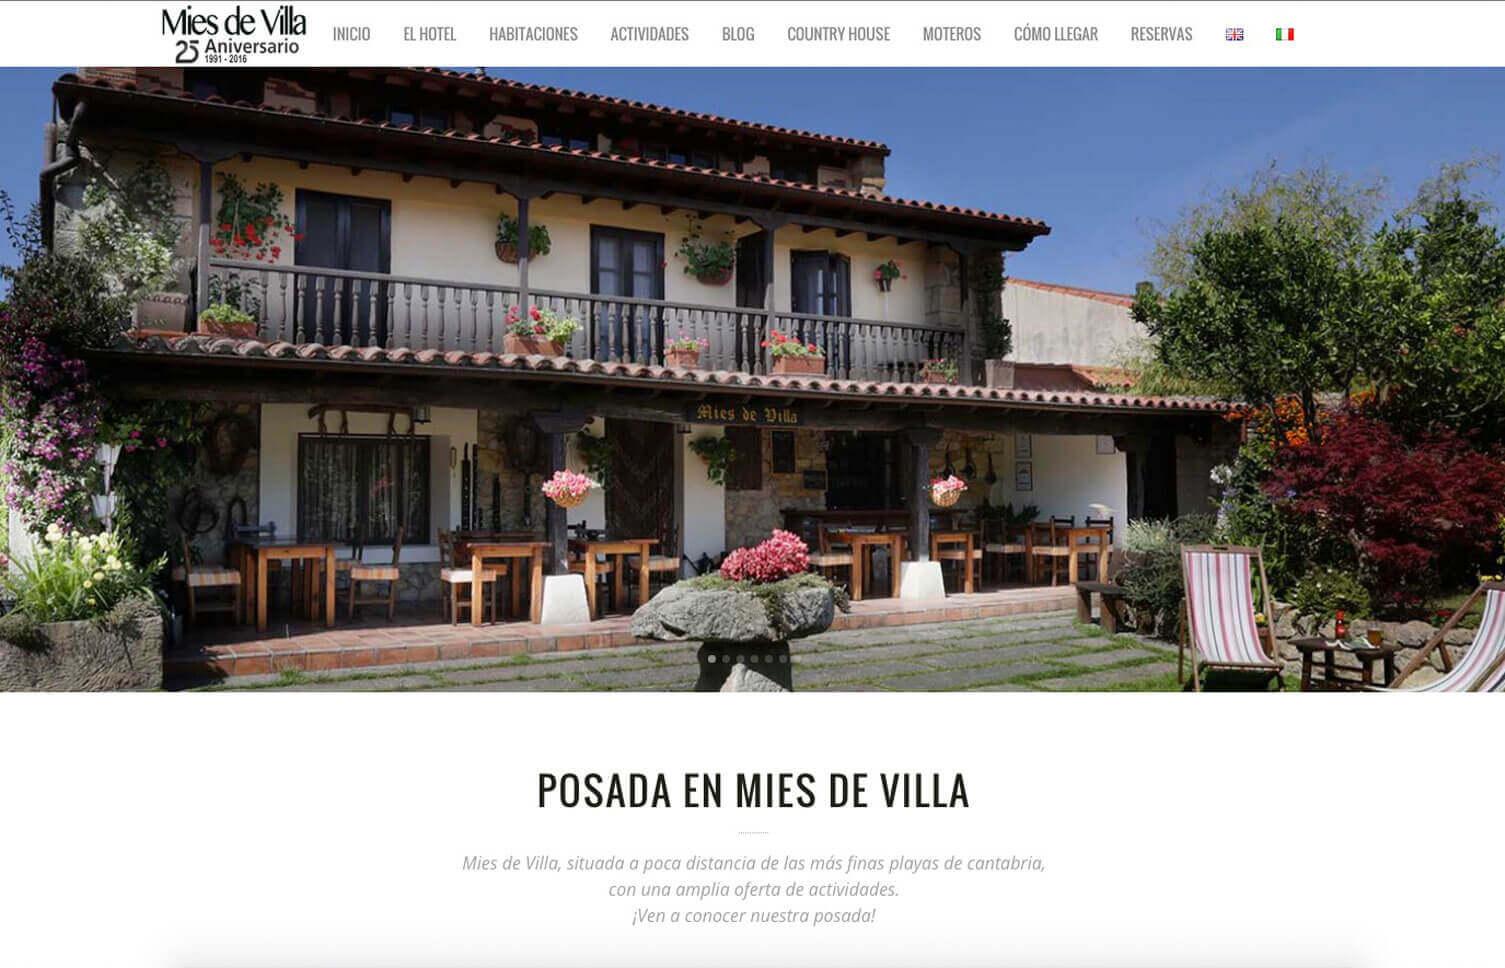 Posada Mies de Villa